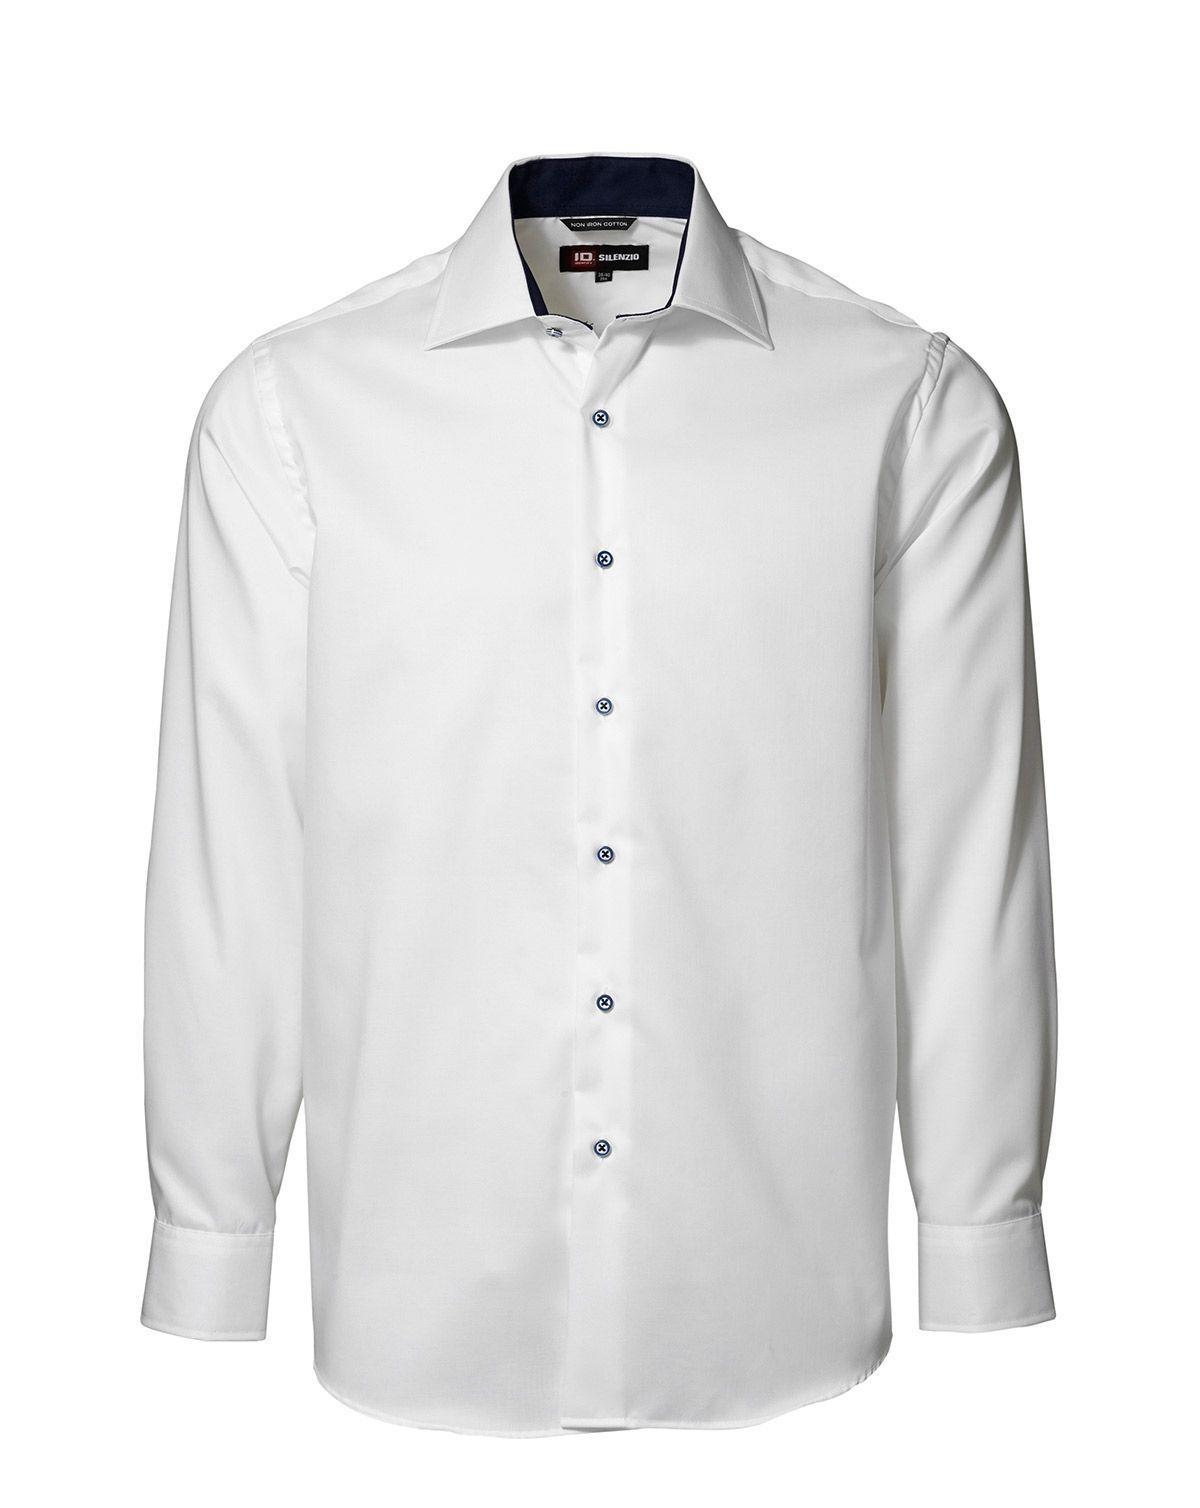 Image of   ID Easy Iron-skjorte (Hvid, 43 / 44)